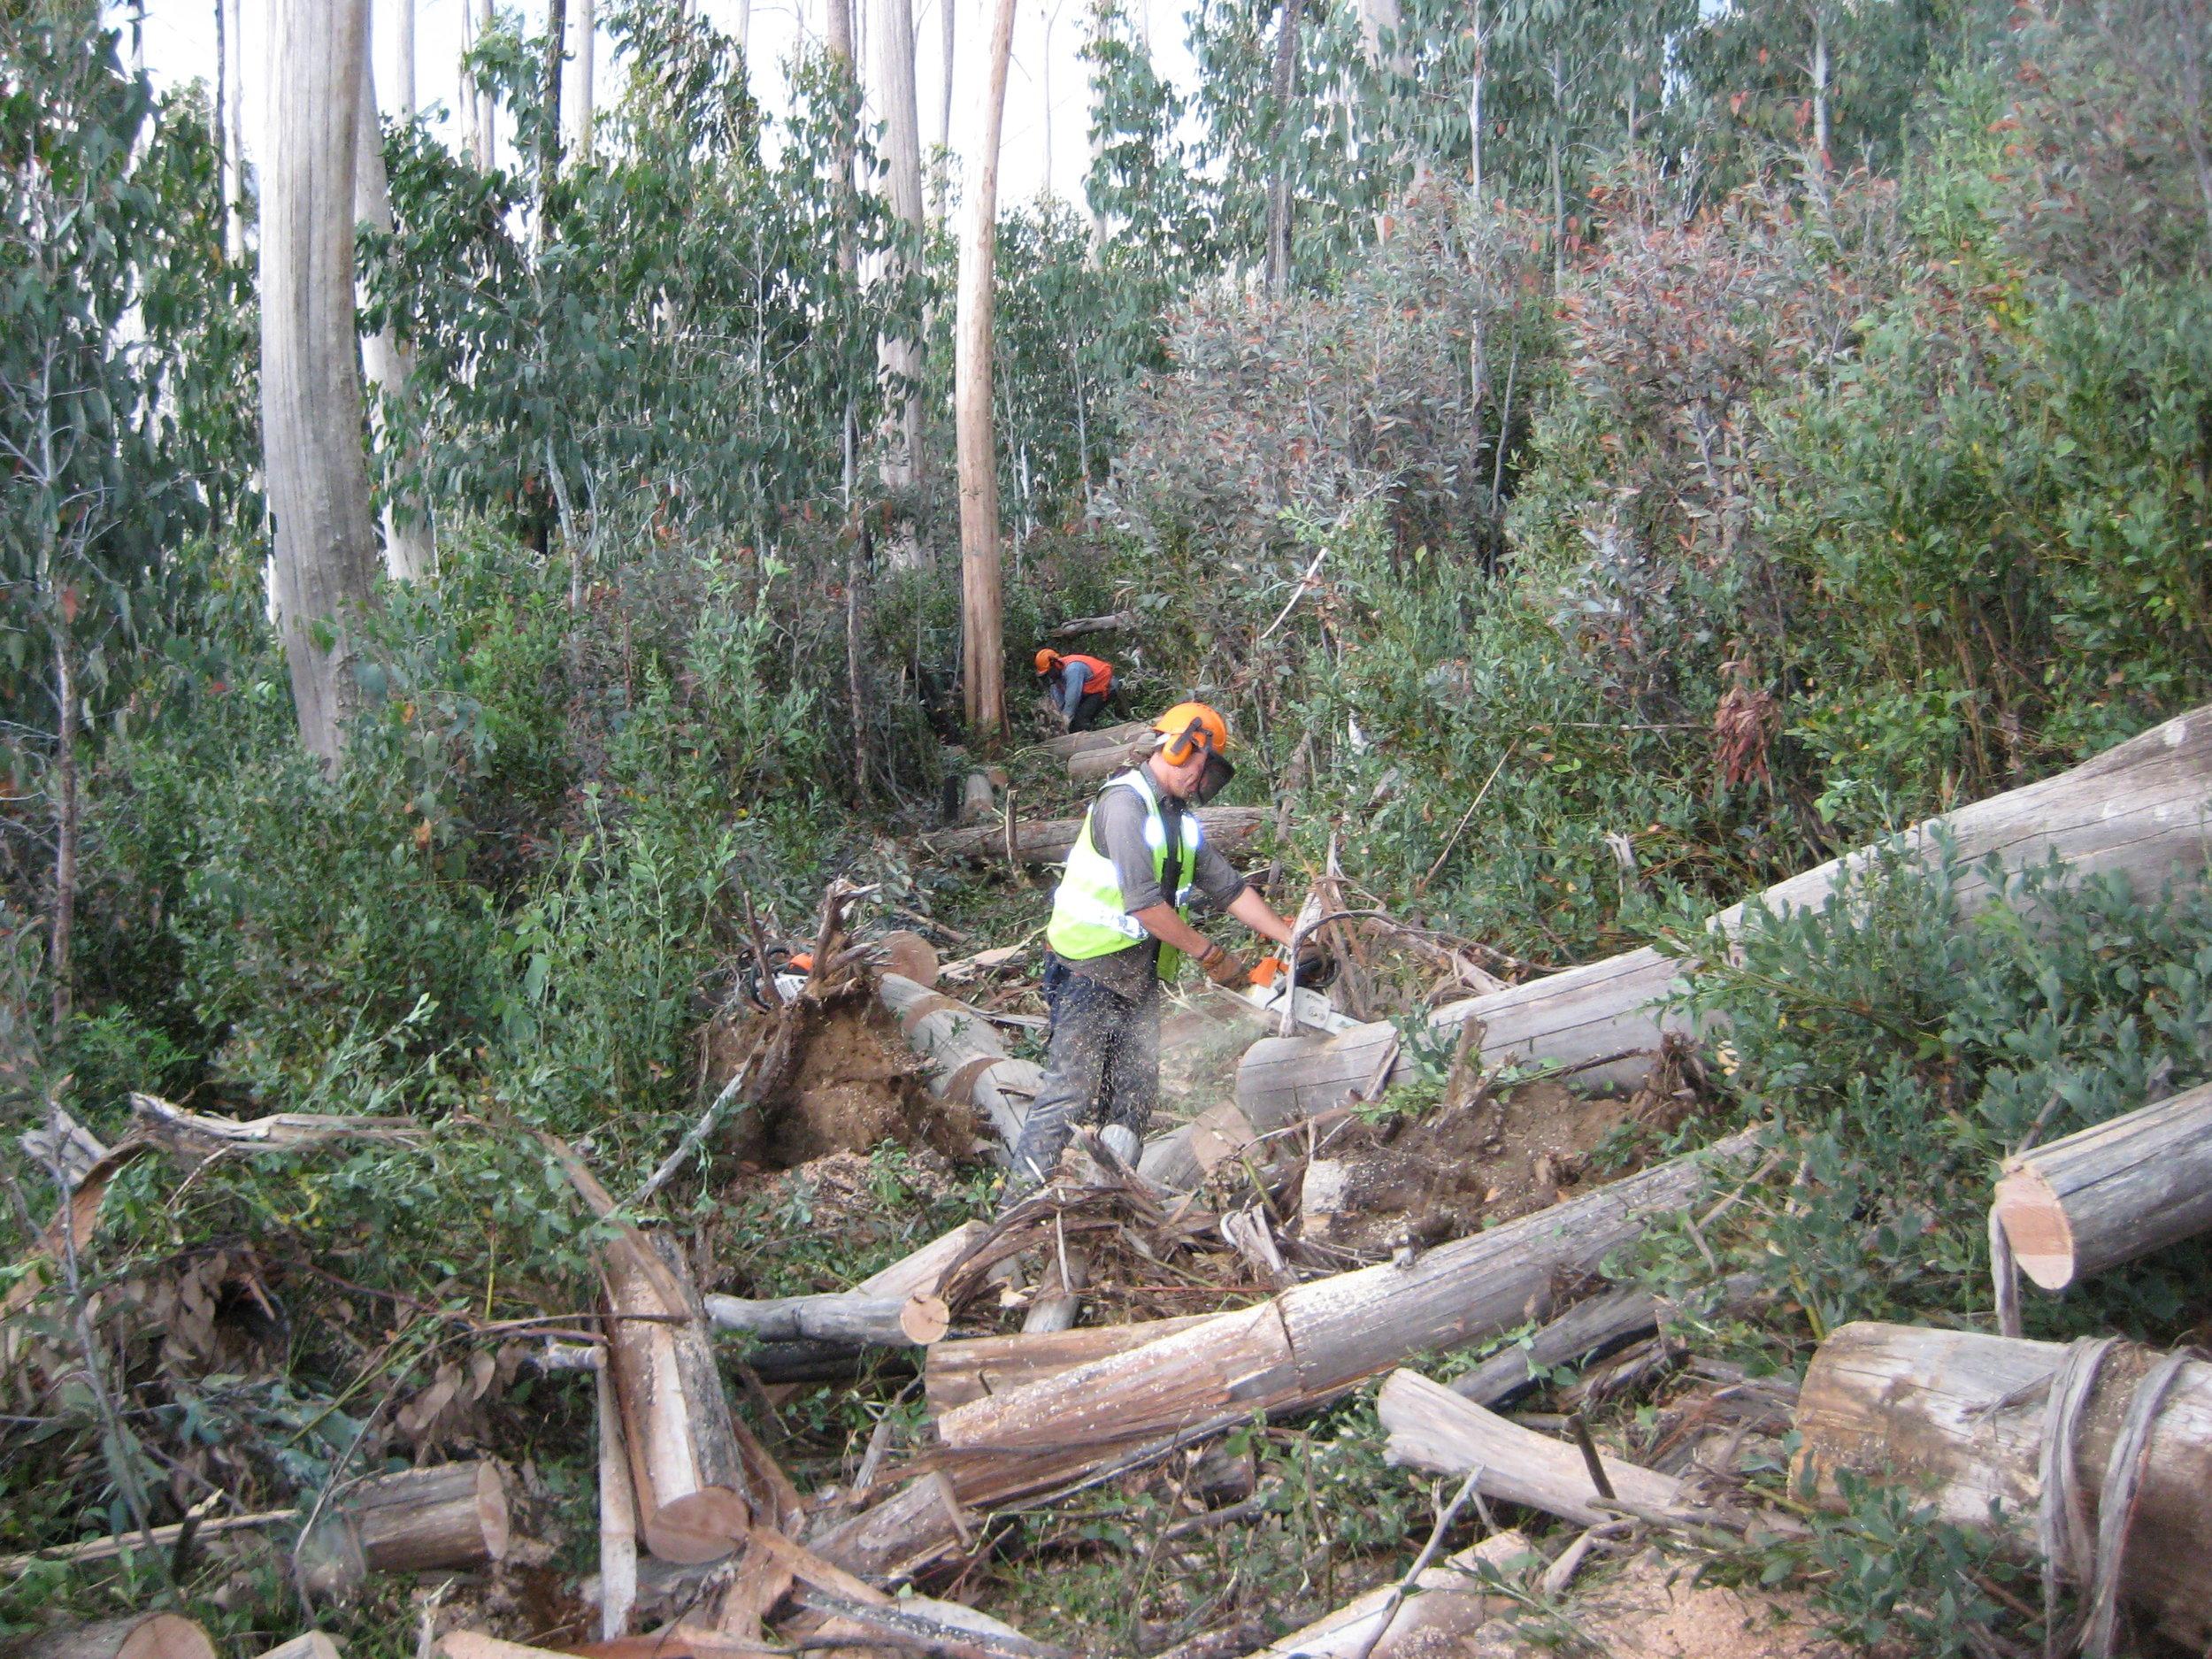 Removing fallen trees